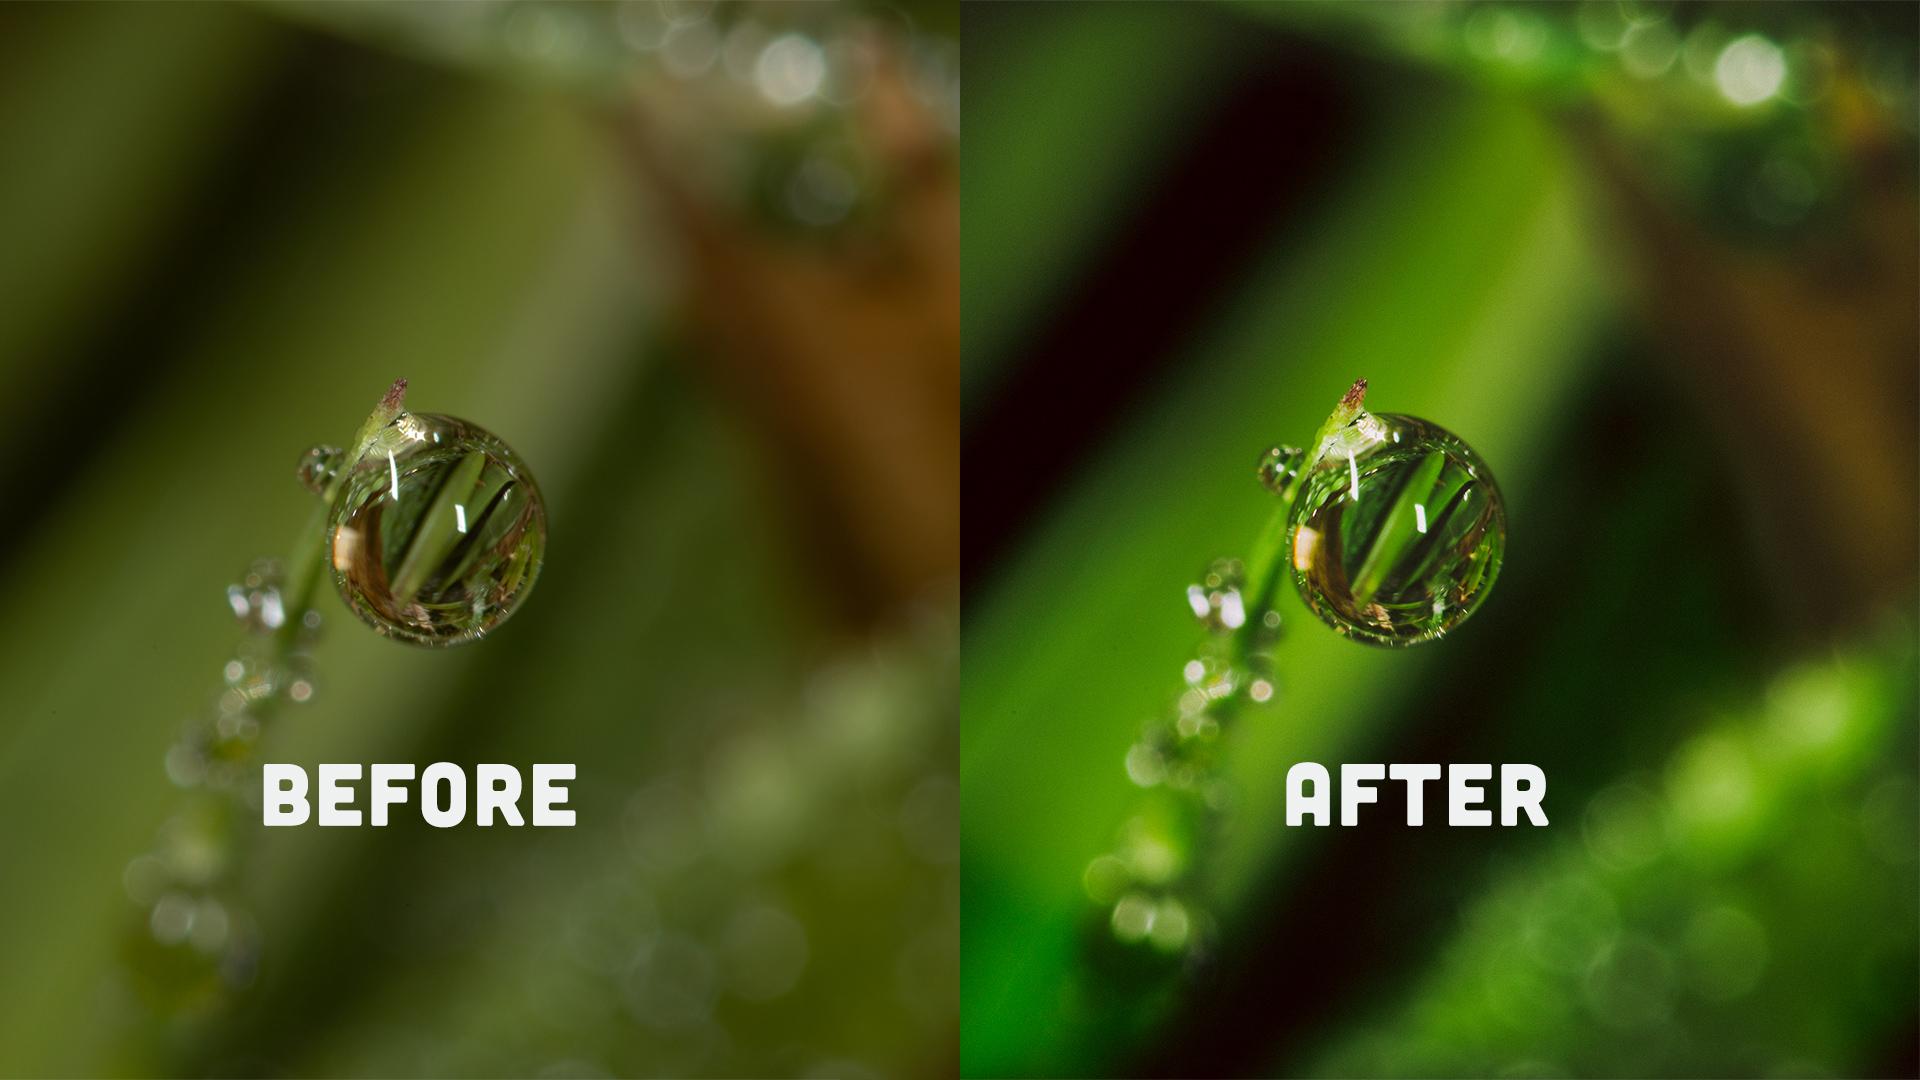 How to edit macro photography